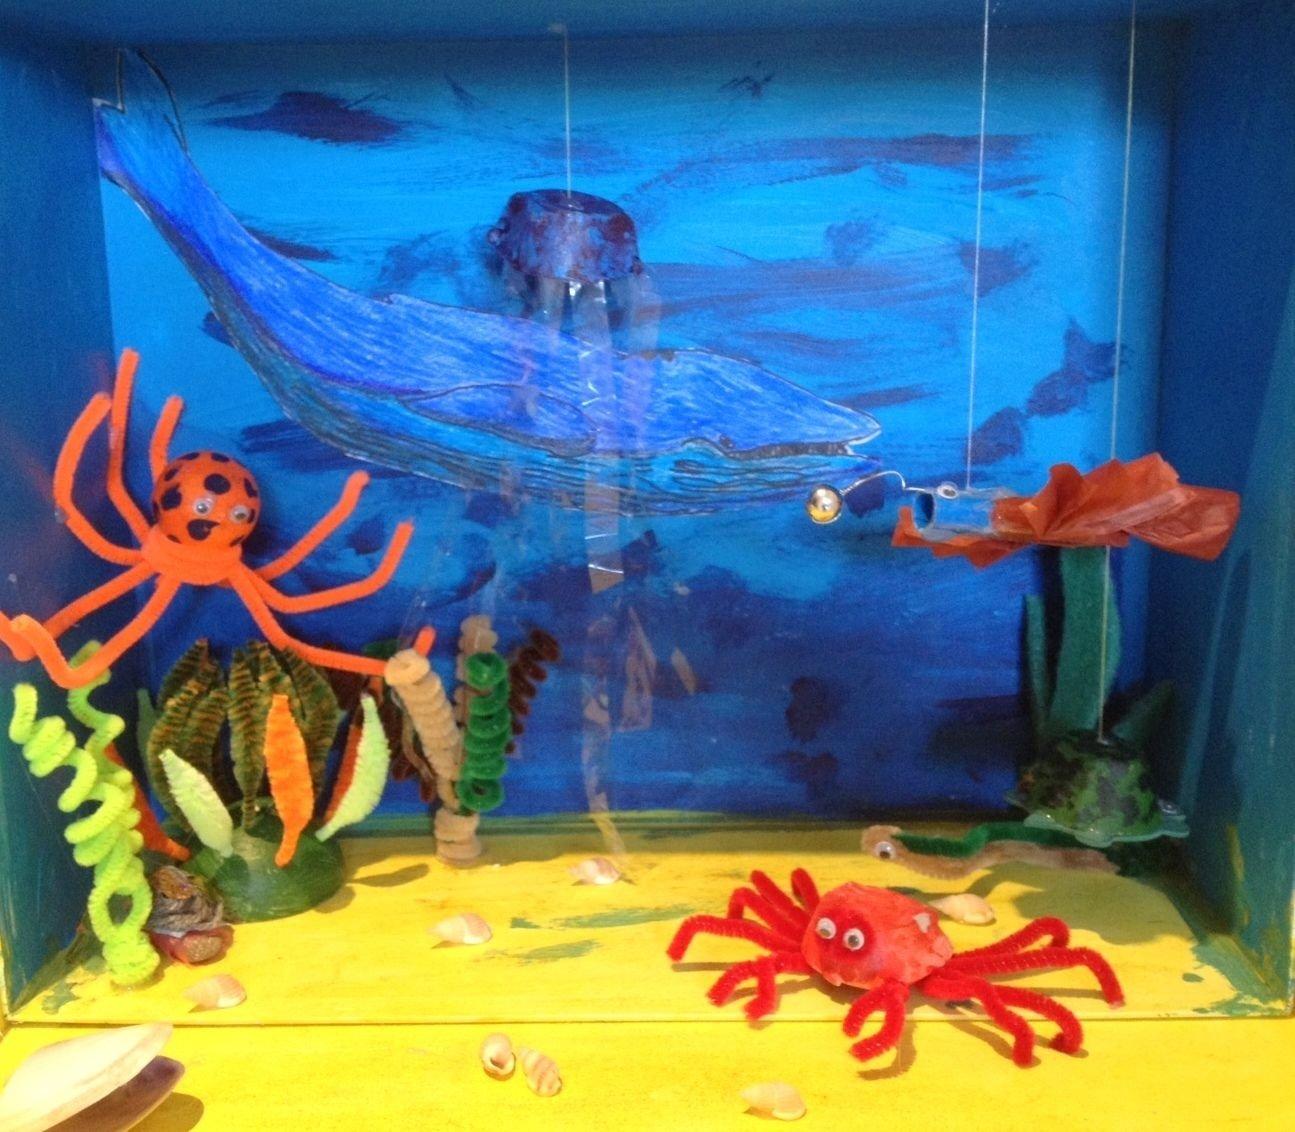 diorama ocean - google search | k-2 kids club | pinterest | dioramas